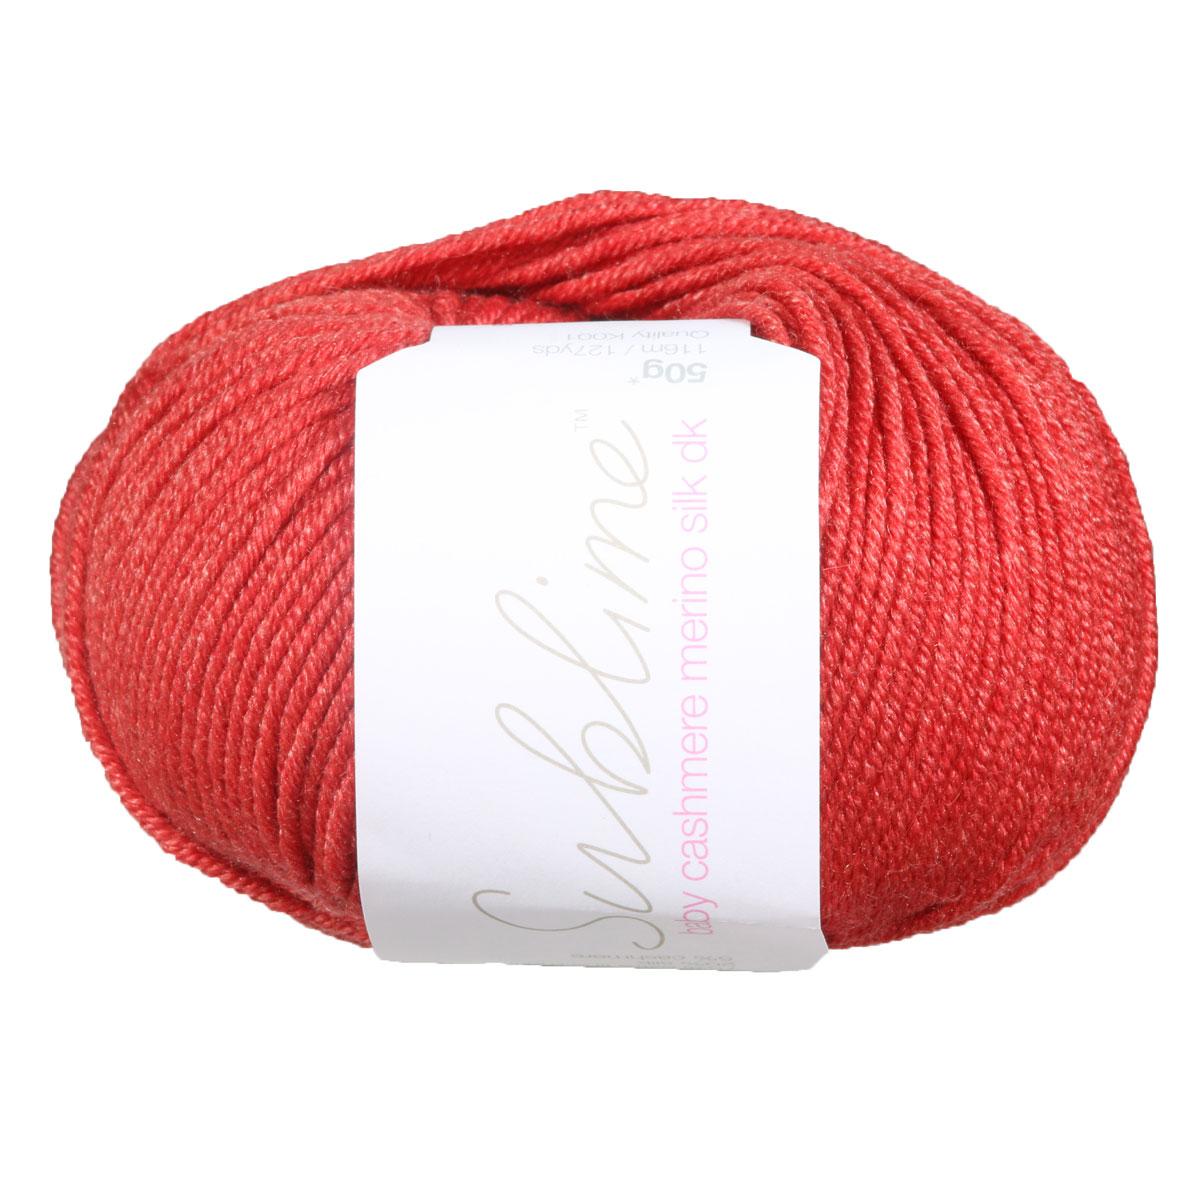 Sublime Baby Cashmere Merino Silk DK 192 Teddy Red Knitting WoolYarn Cashmerino